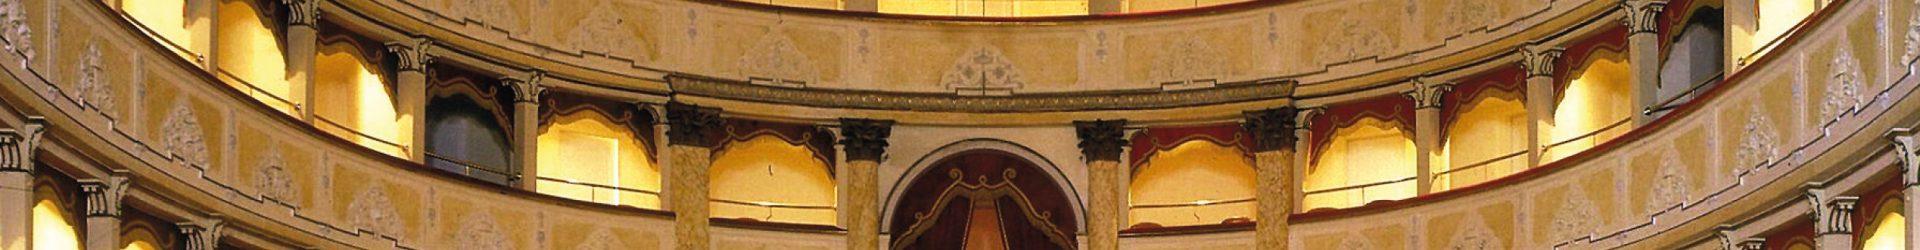 Tre Teatri storici a Firenze – Origini, esegesi, restauro